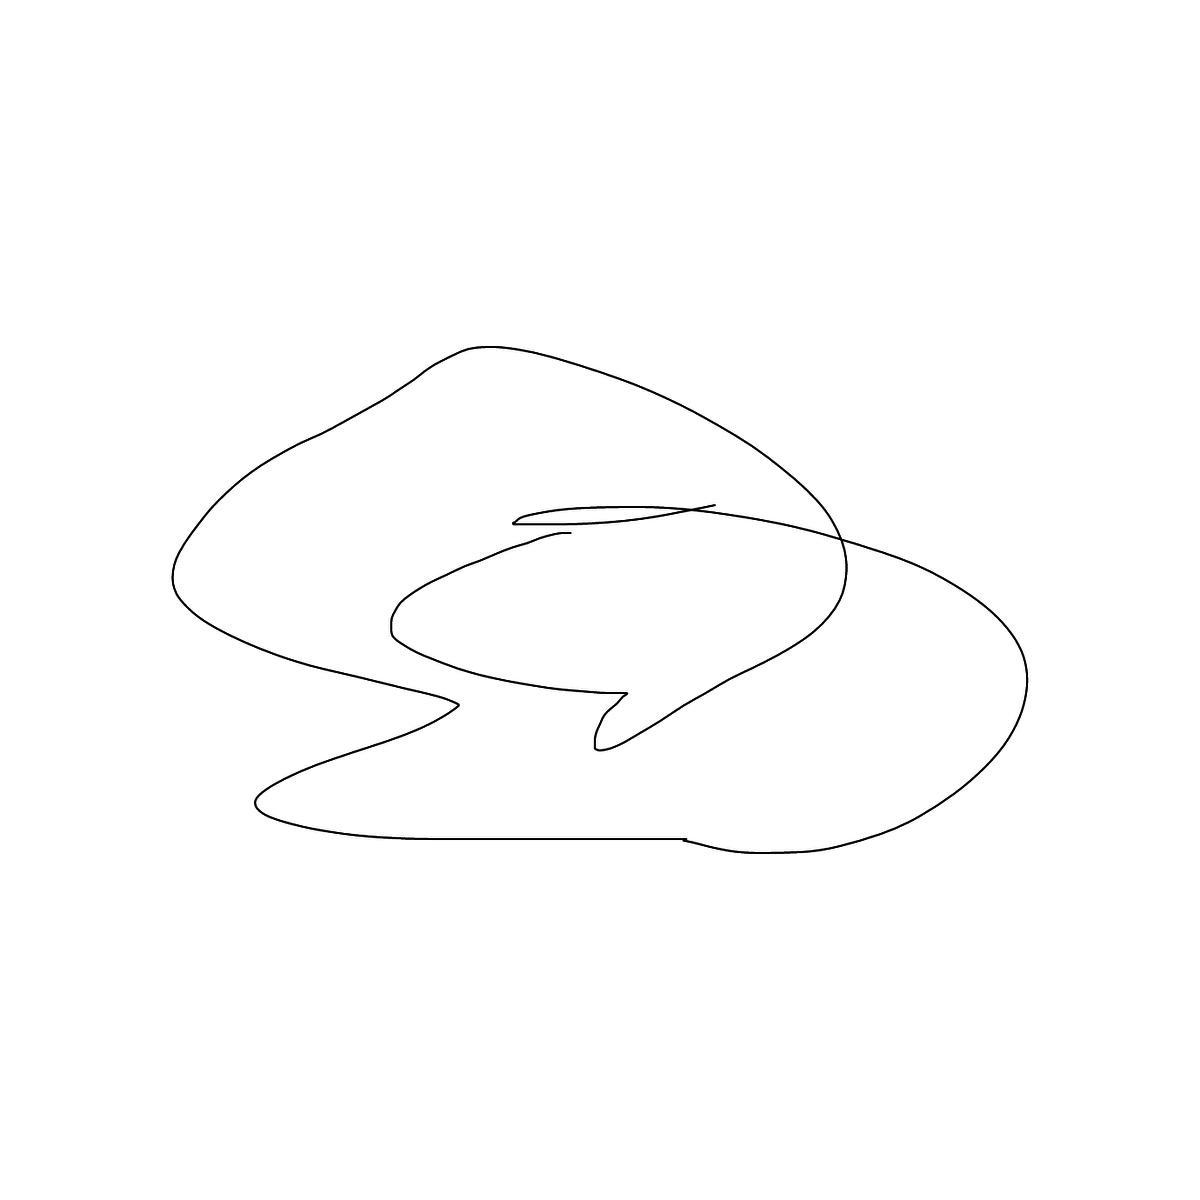 BAAAM drawing#8140 lat:50.2266540527343750lng: 8.6115827560424800